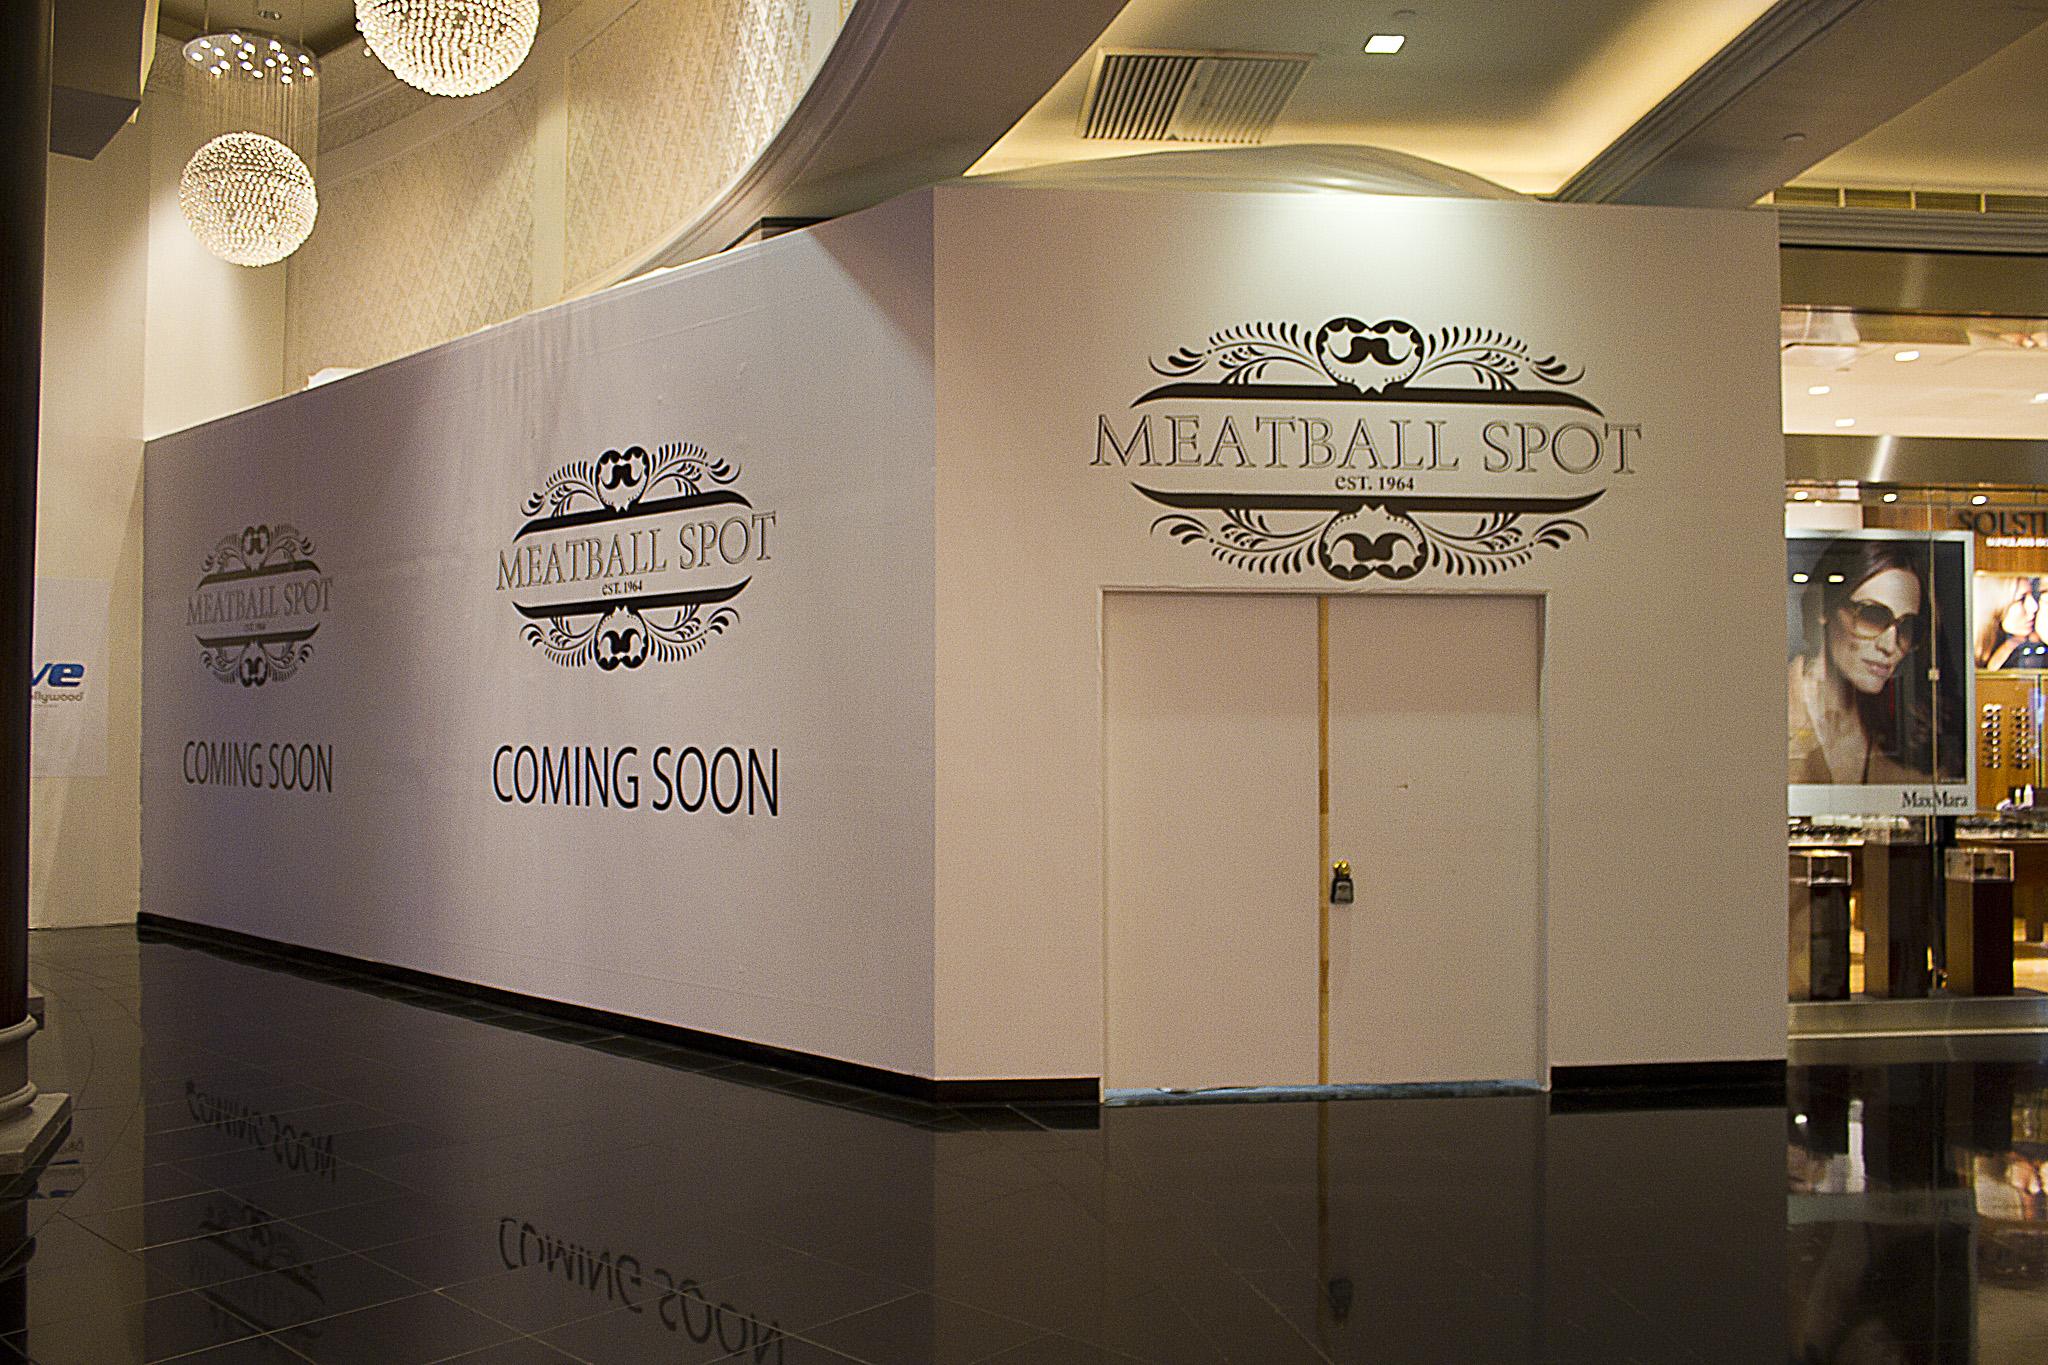 meatball%20spot%20plywood.jpg